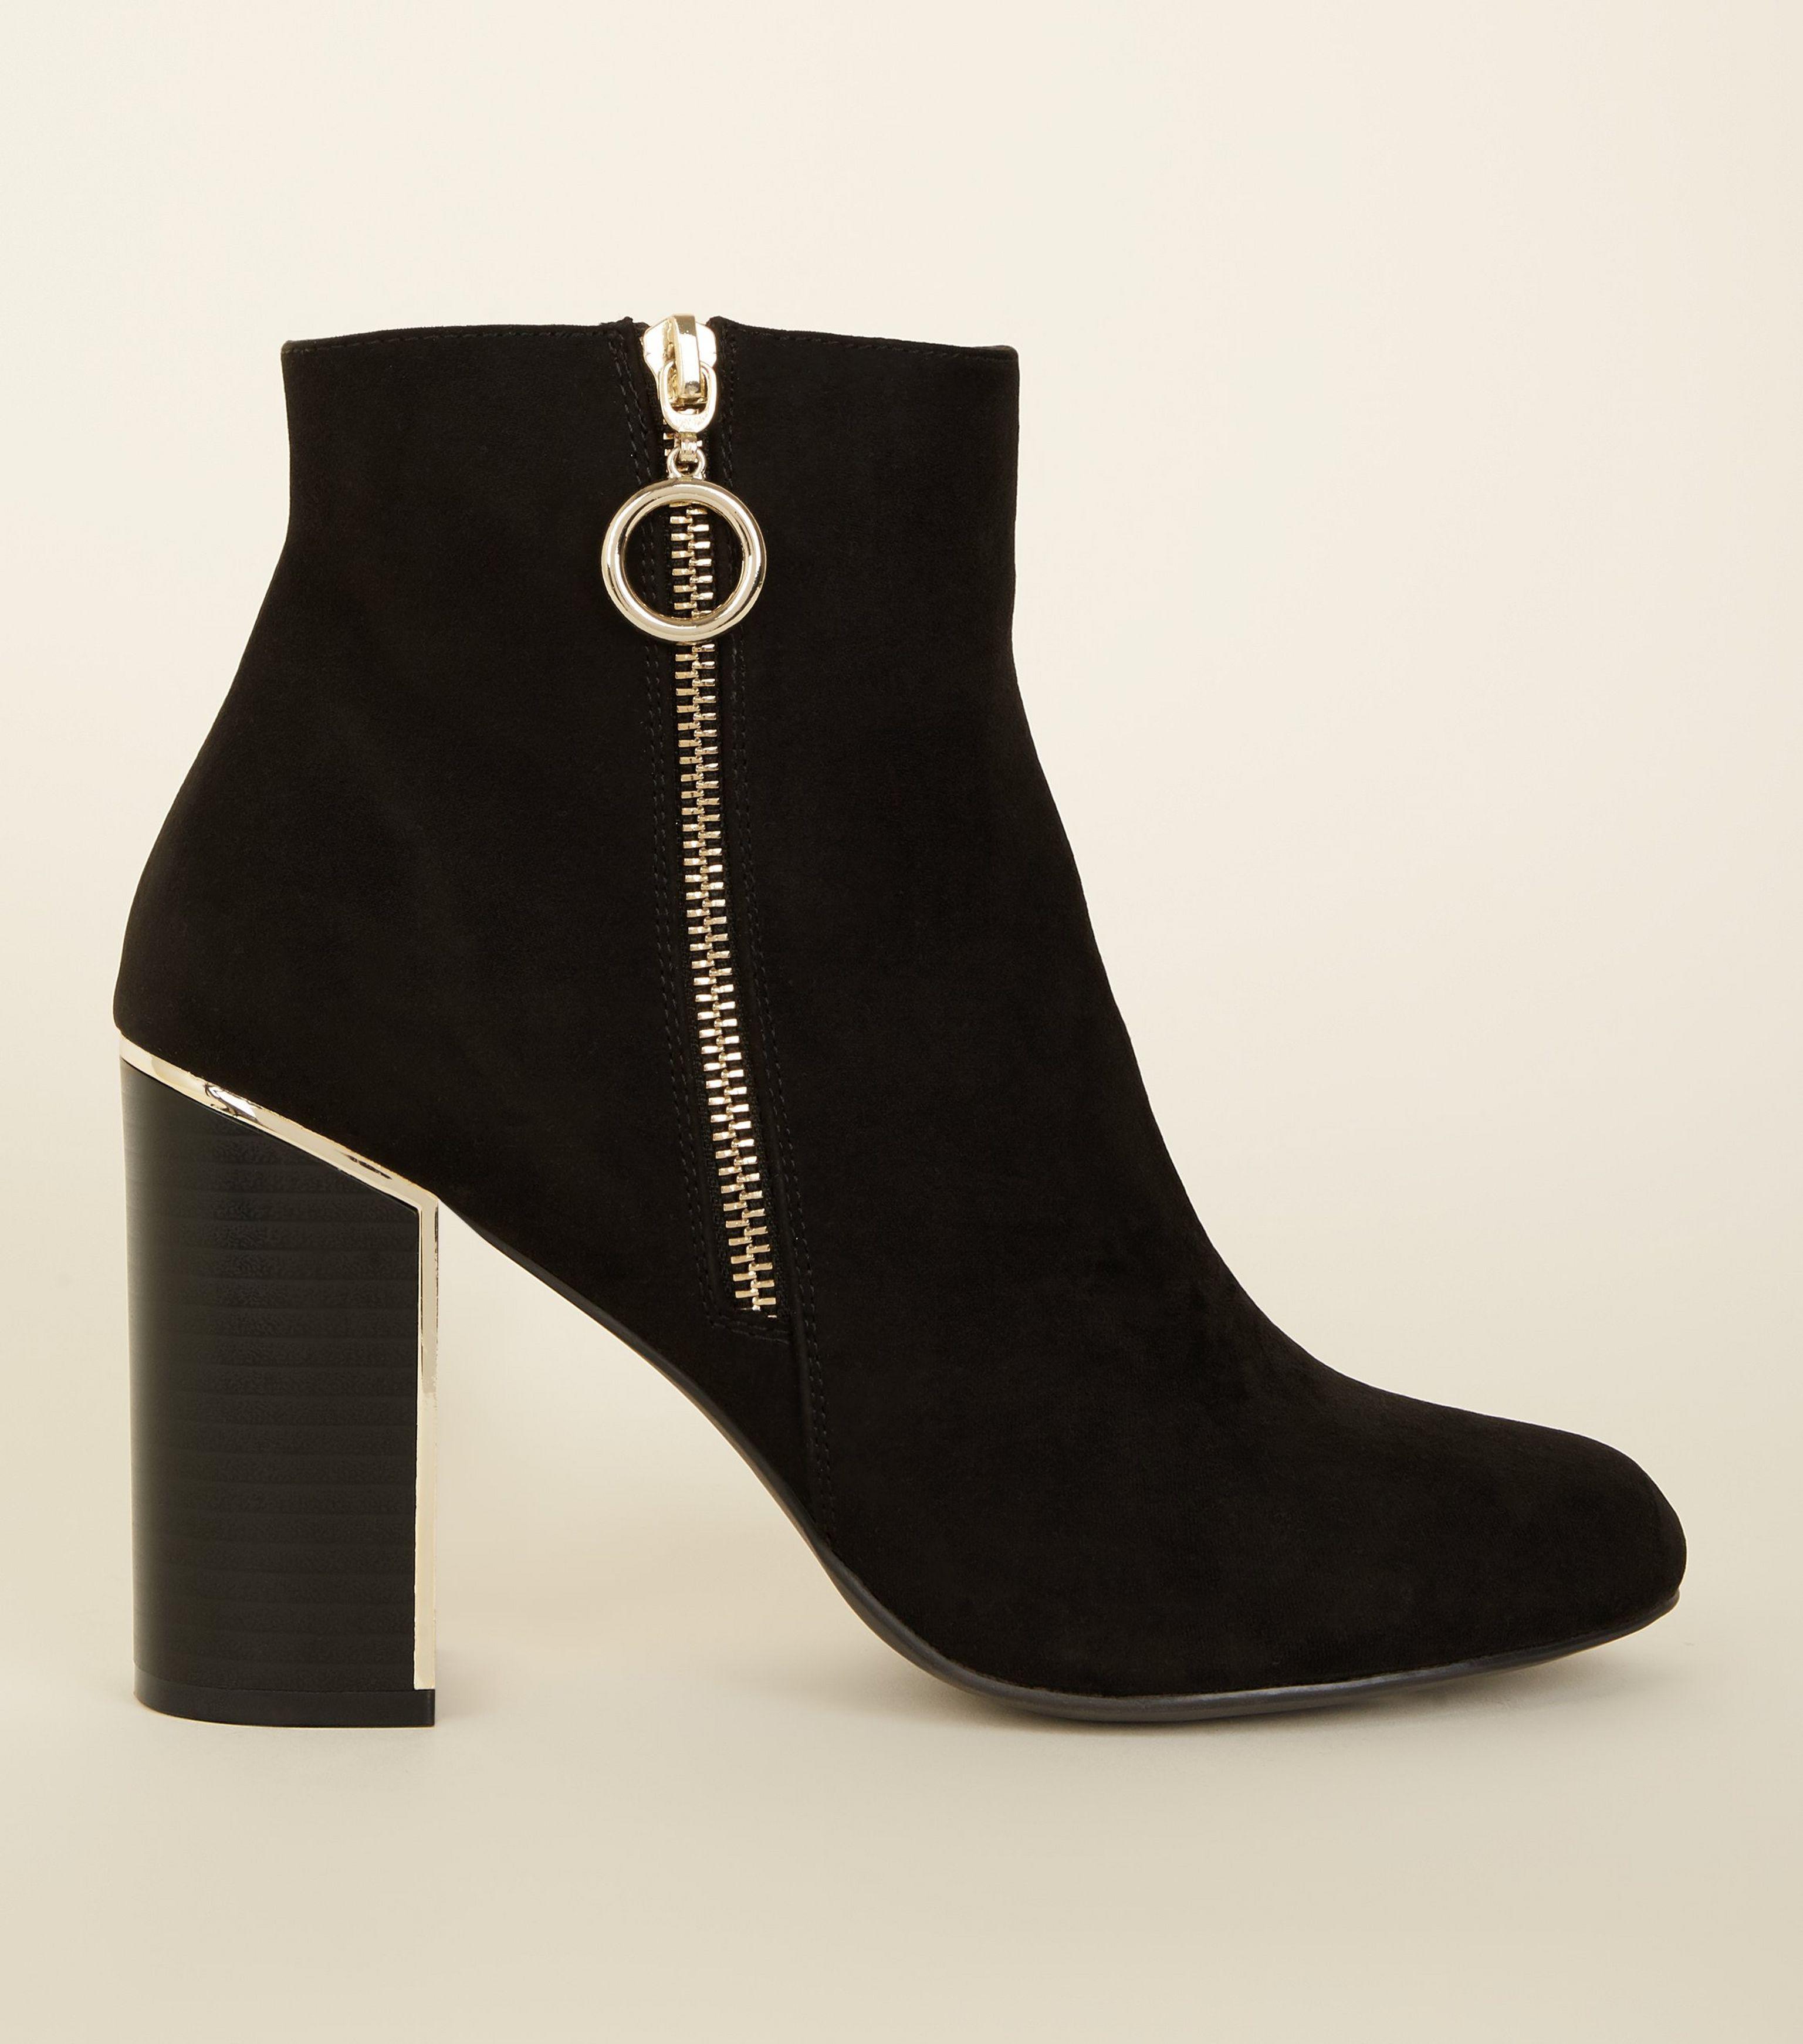 f3c08562454d New Look Black Suedette Metal Heel Ankle Boot in Black - Lyst